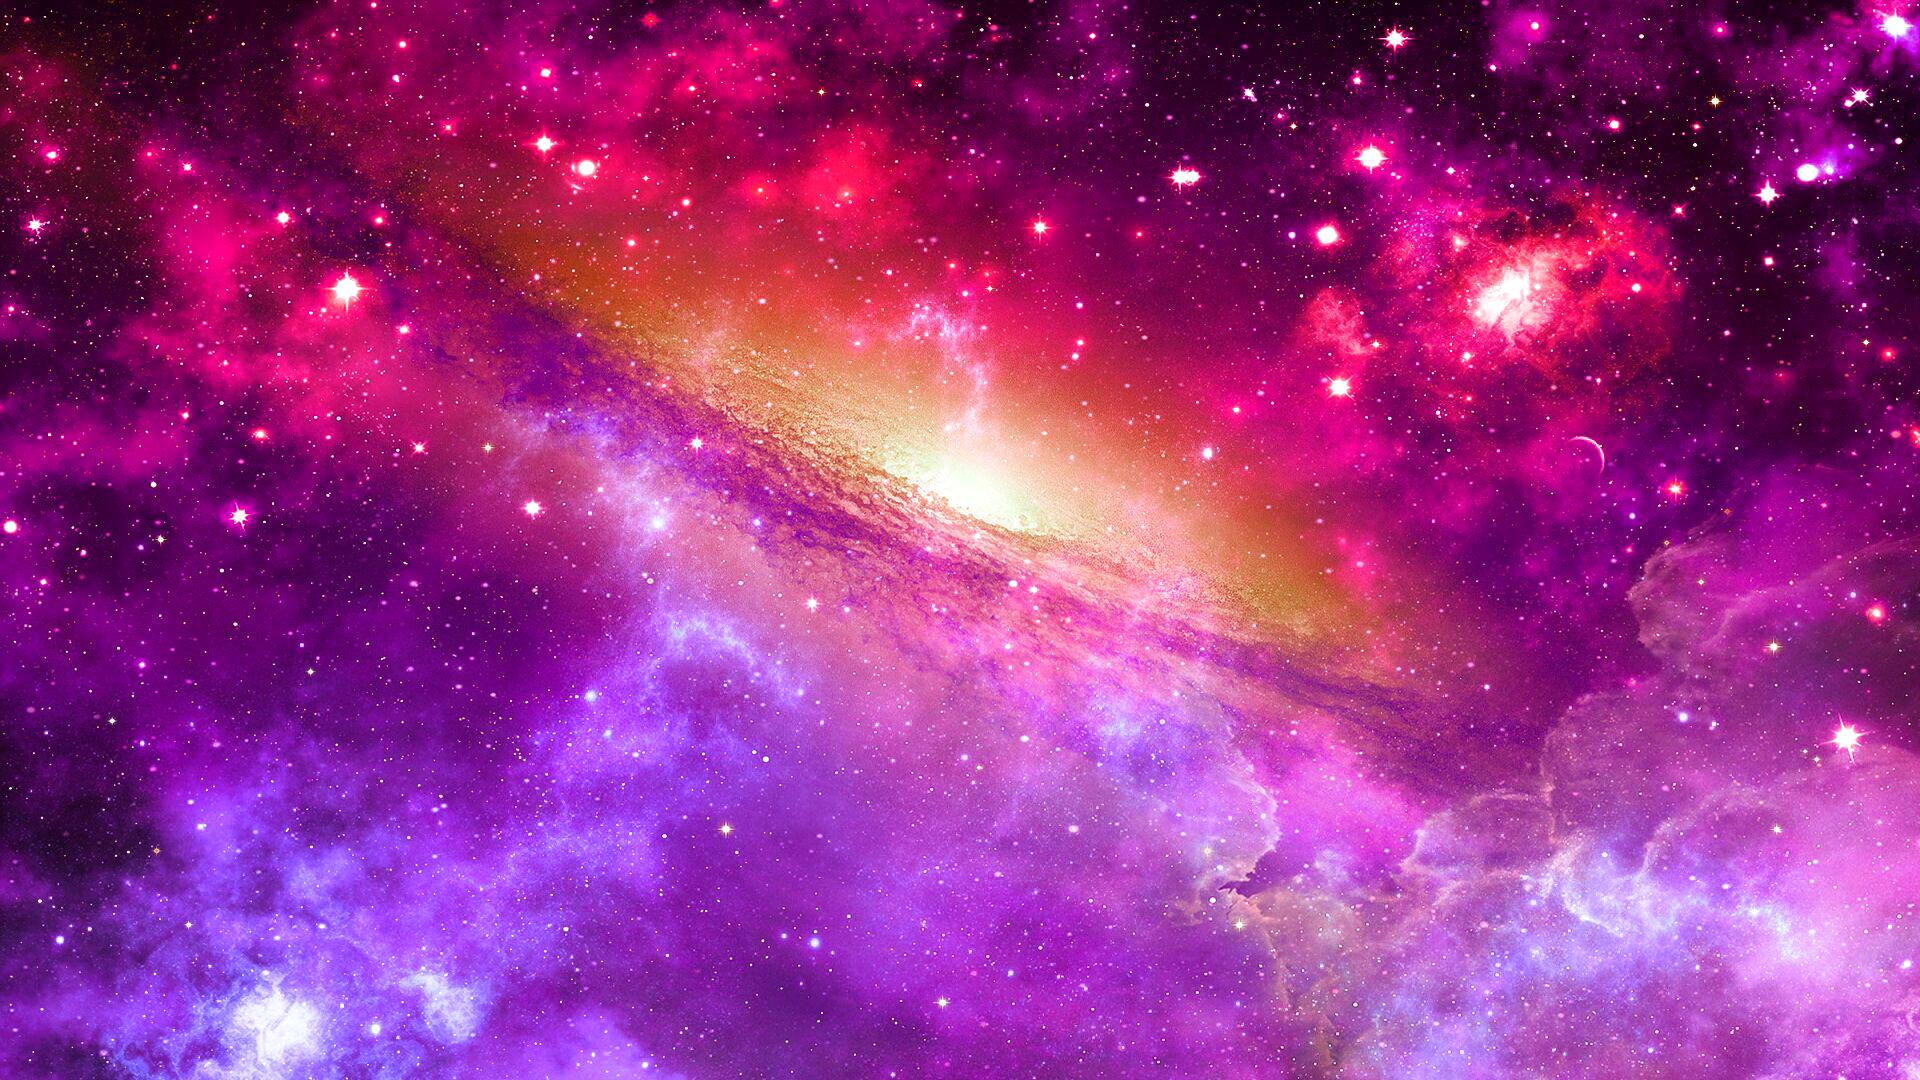 Download Wallpaper 1920x1080 Space Universe Nebula Star Light